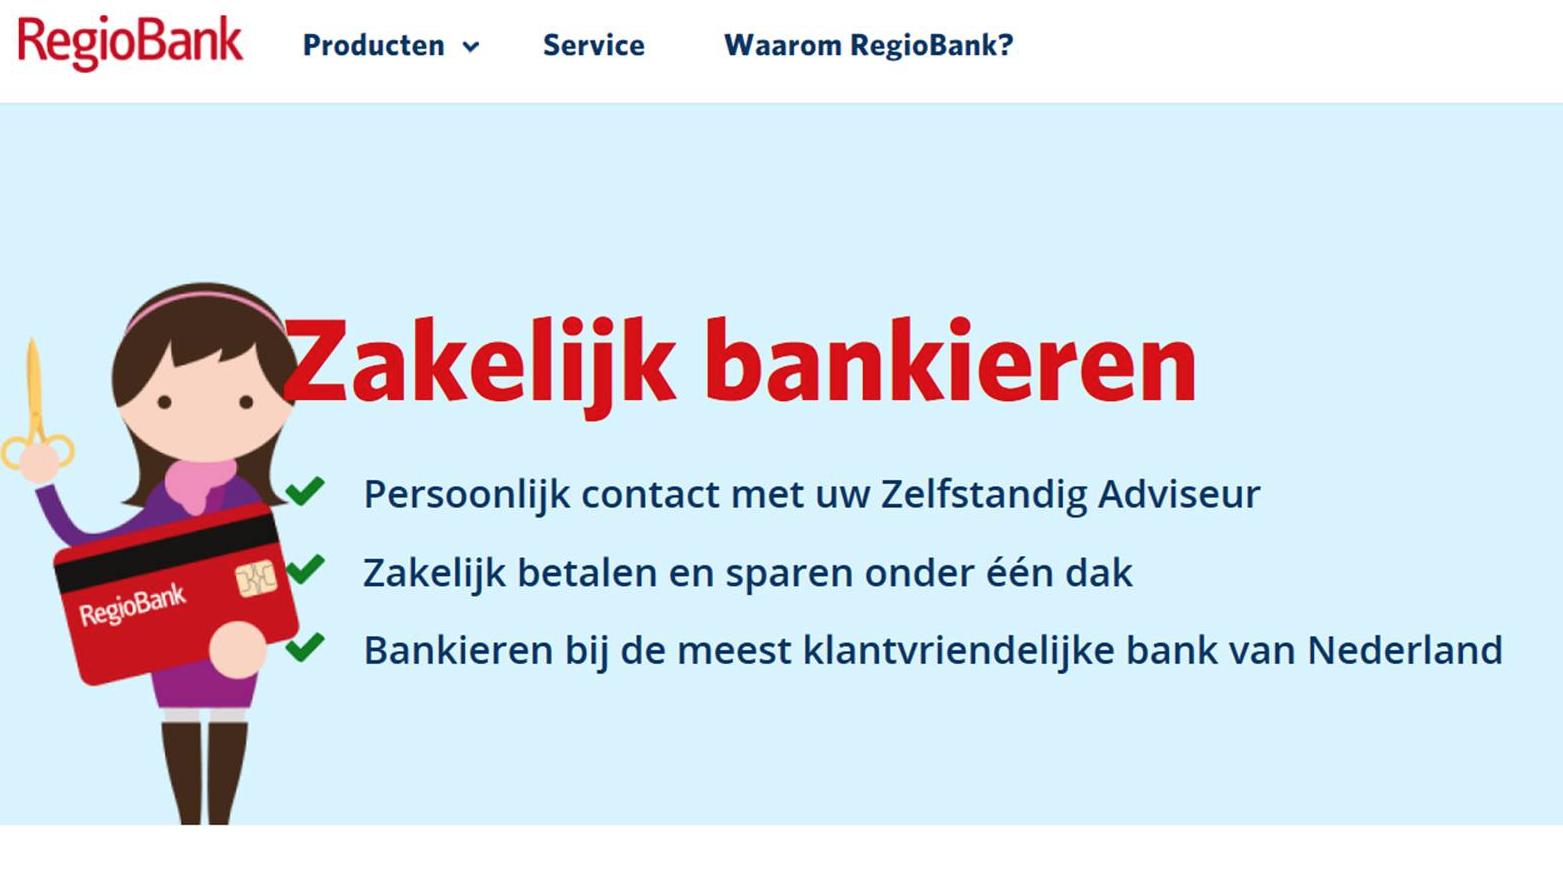 RegioBank Zakelijk bankieren - Nathalie Samson